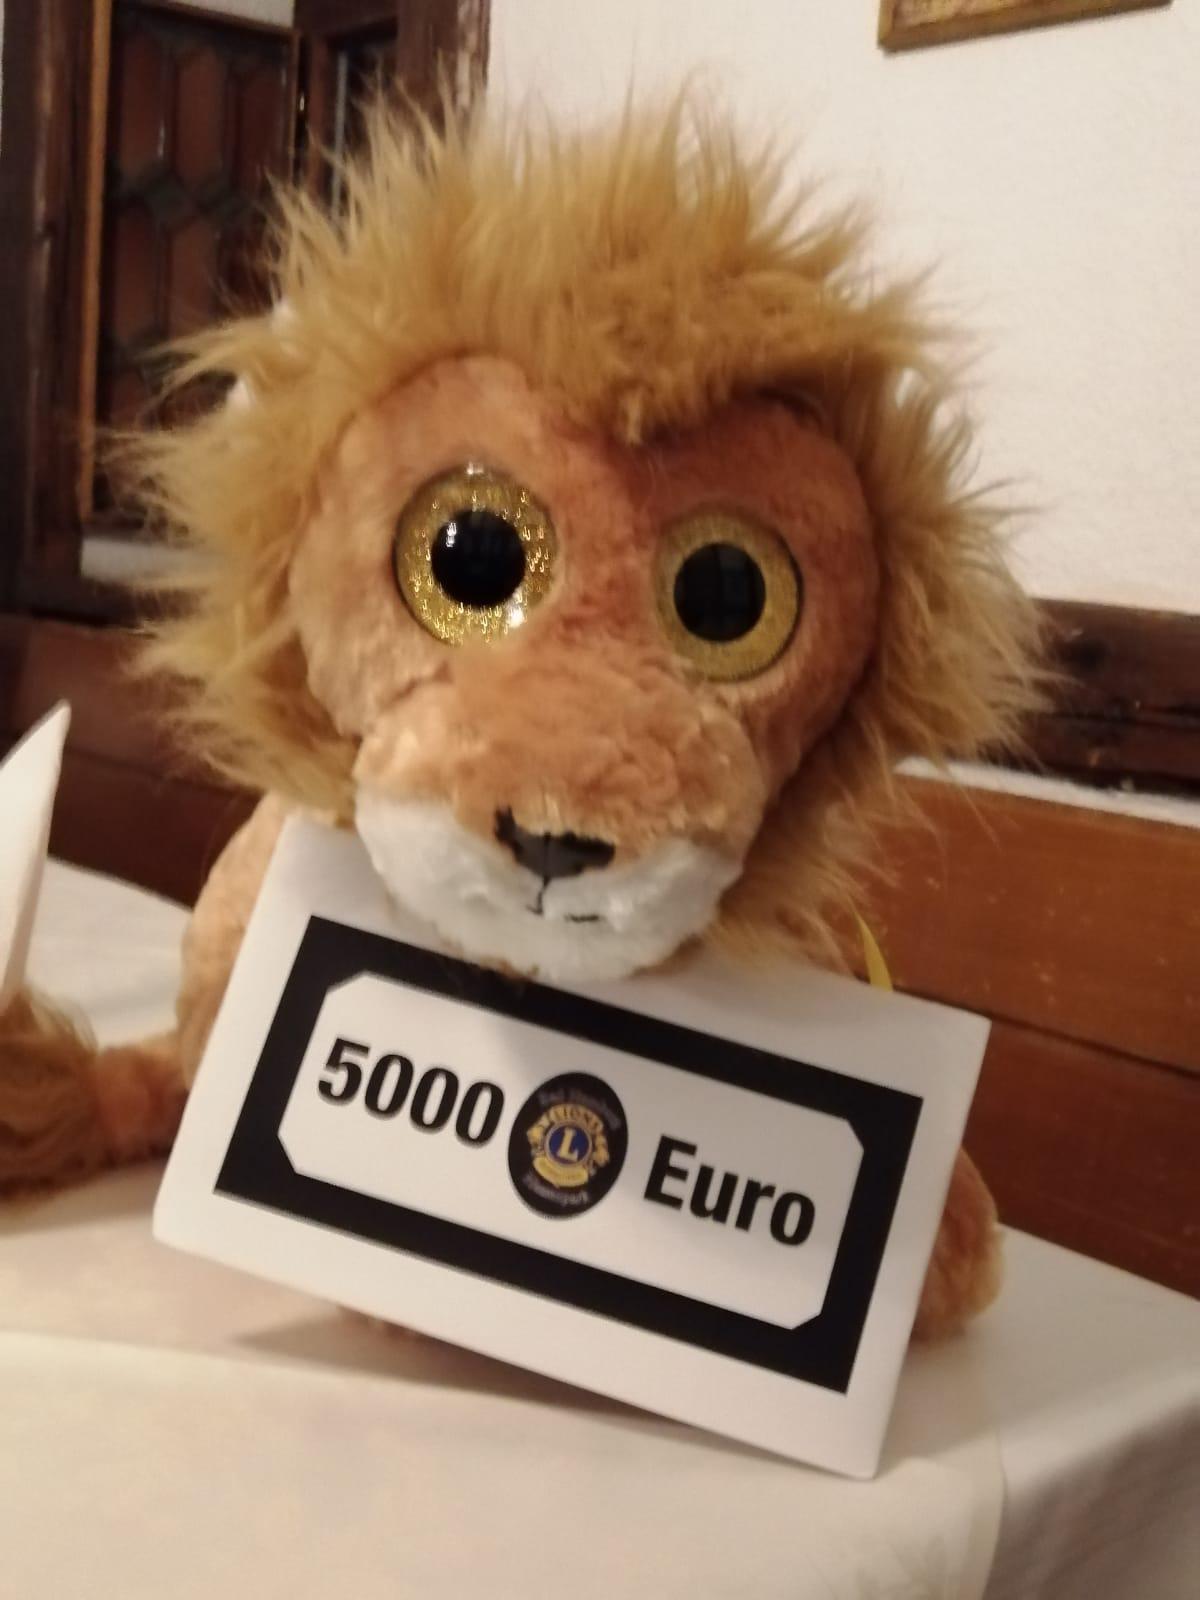 Lions Club Bad Homburg spenden 5000 Euro